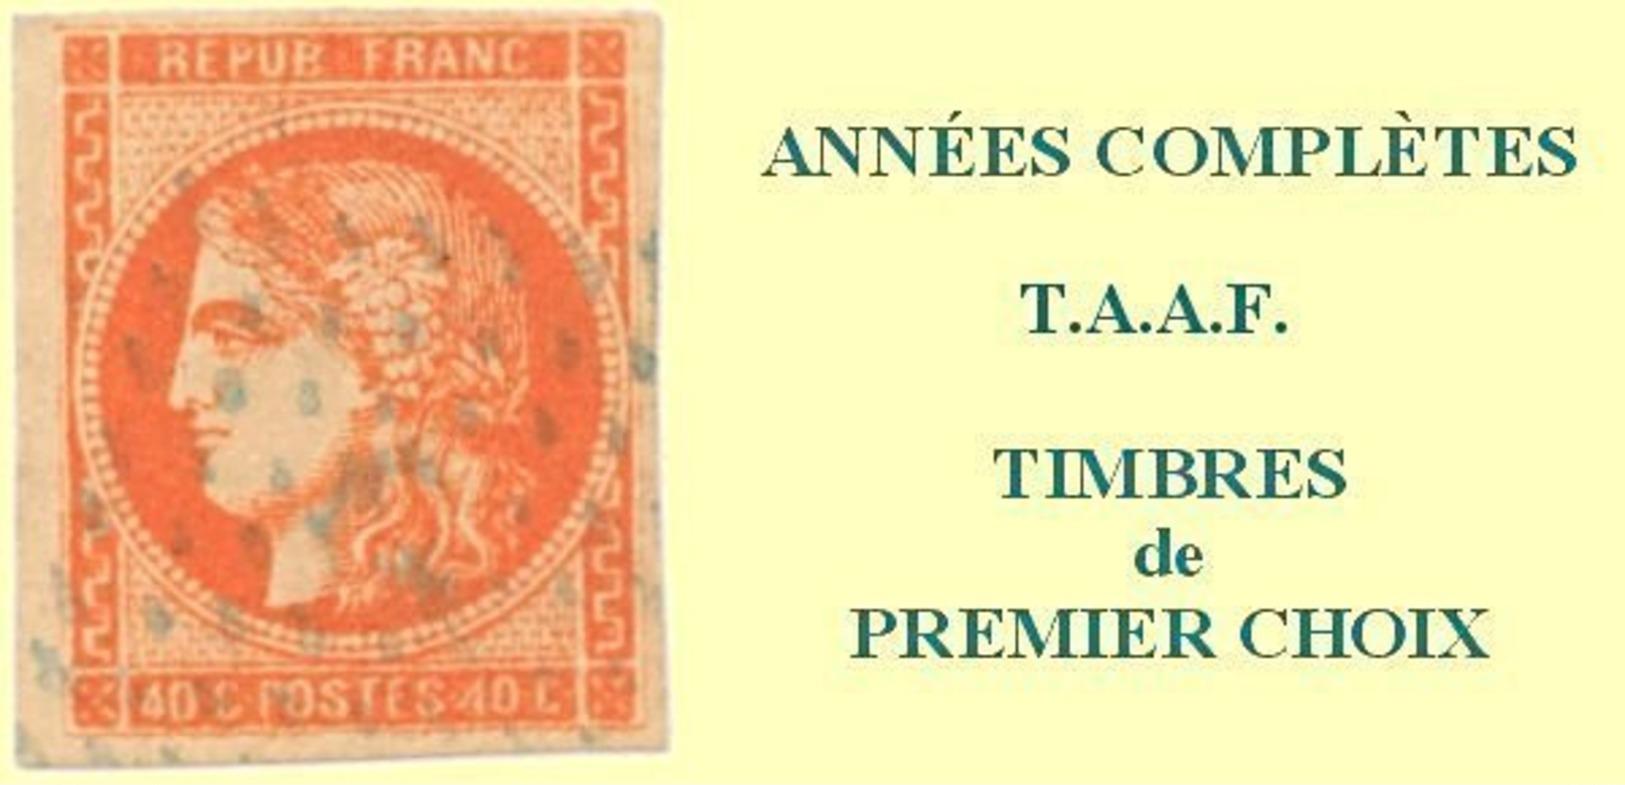 TAAF, Année Complète 1978**, Poste N°74 à N°78, P.A. N°51 à N°55  Y & T - Full Years